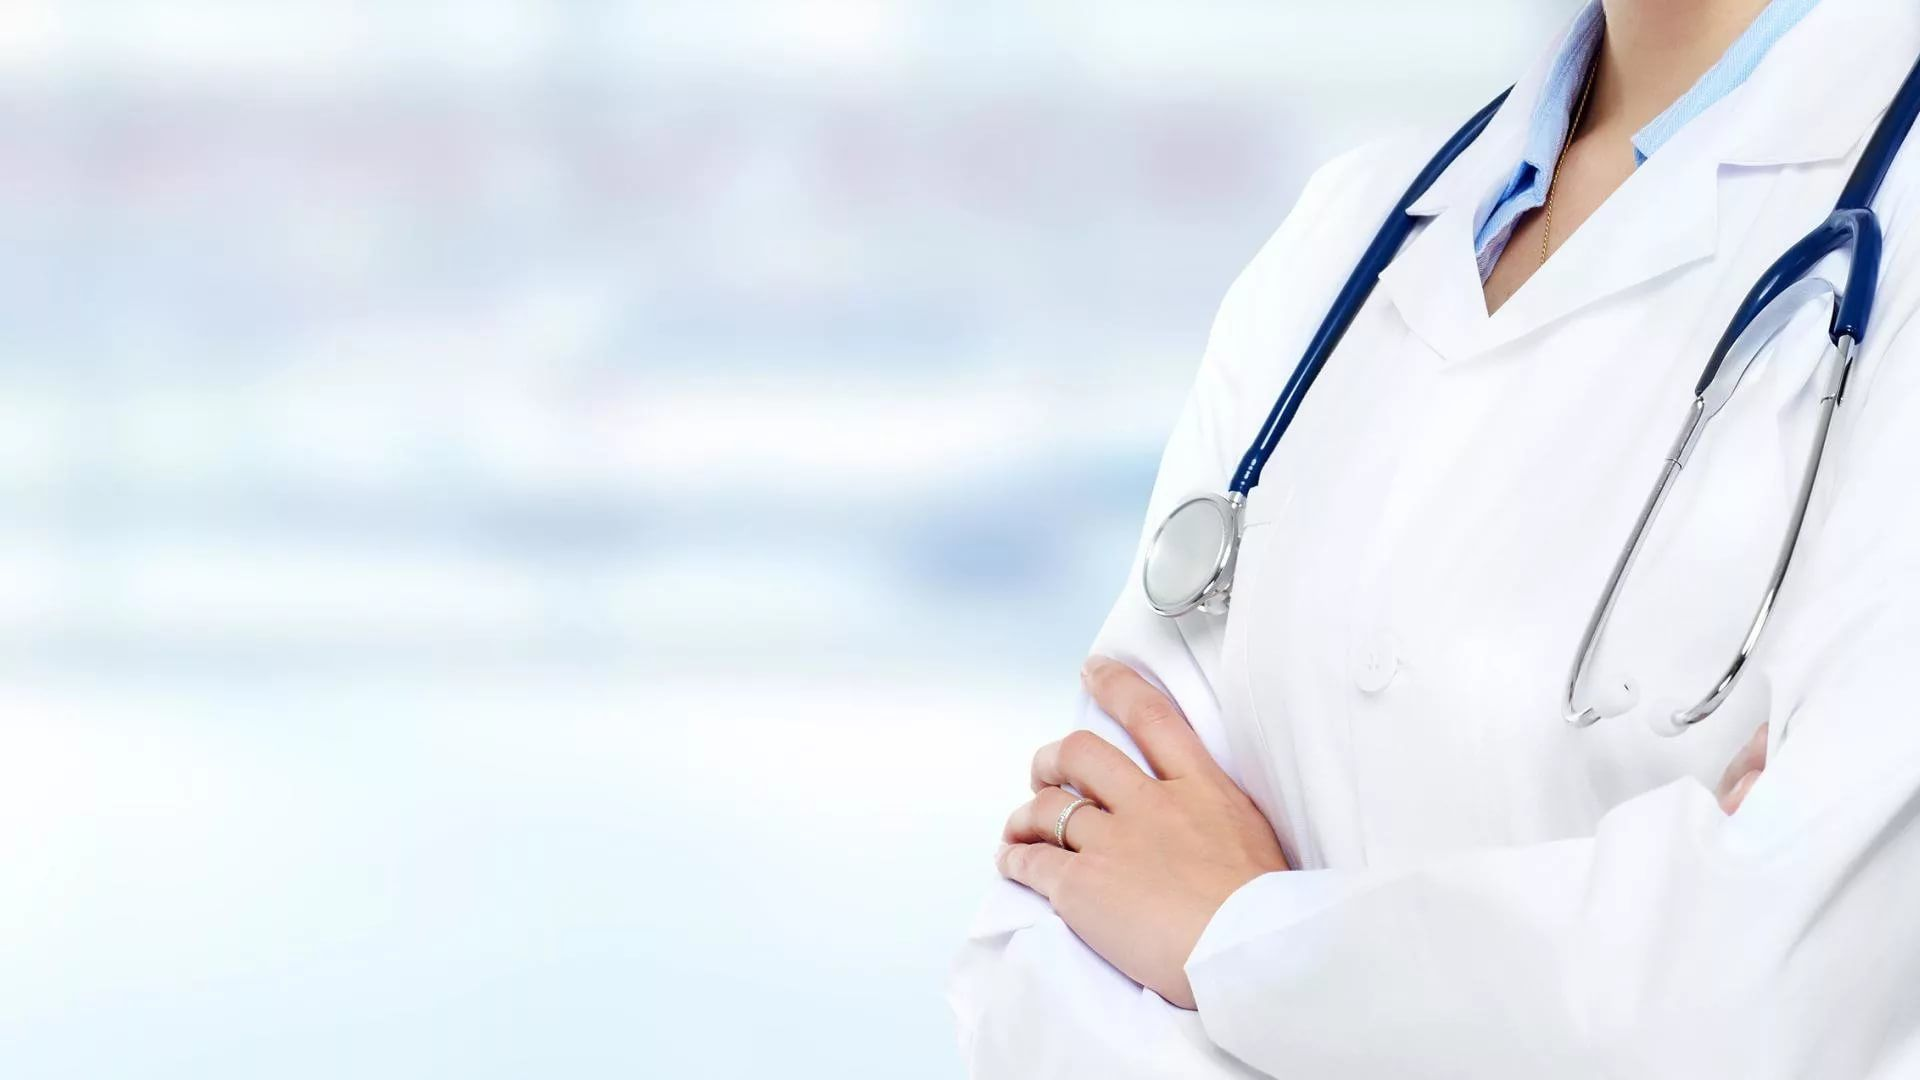 Medical wallpaper theme